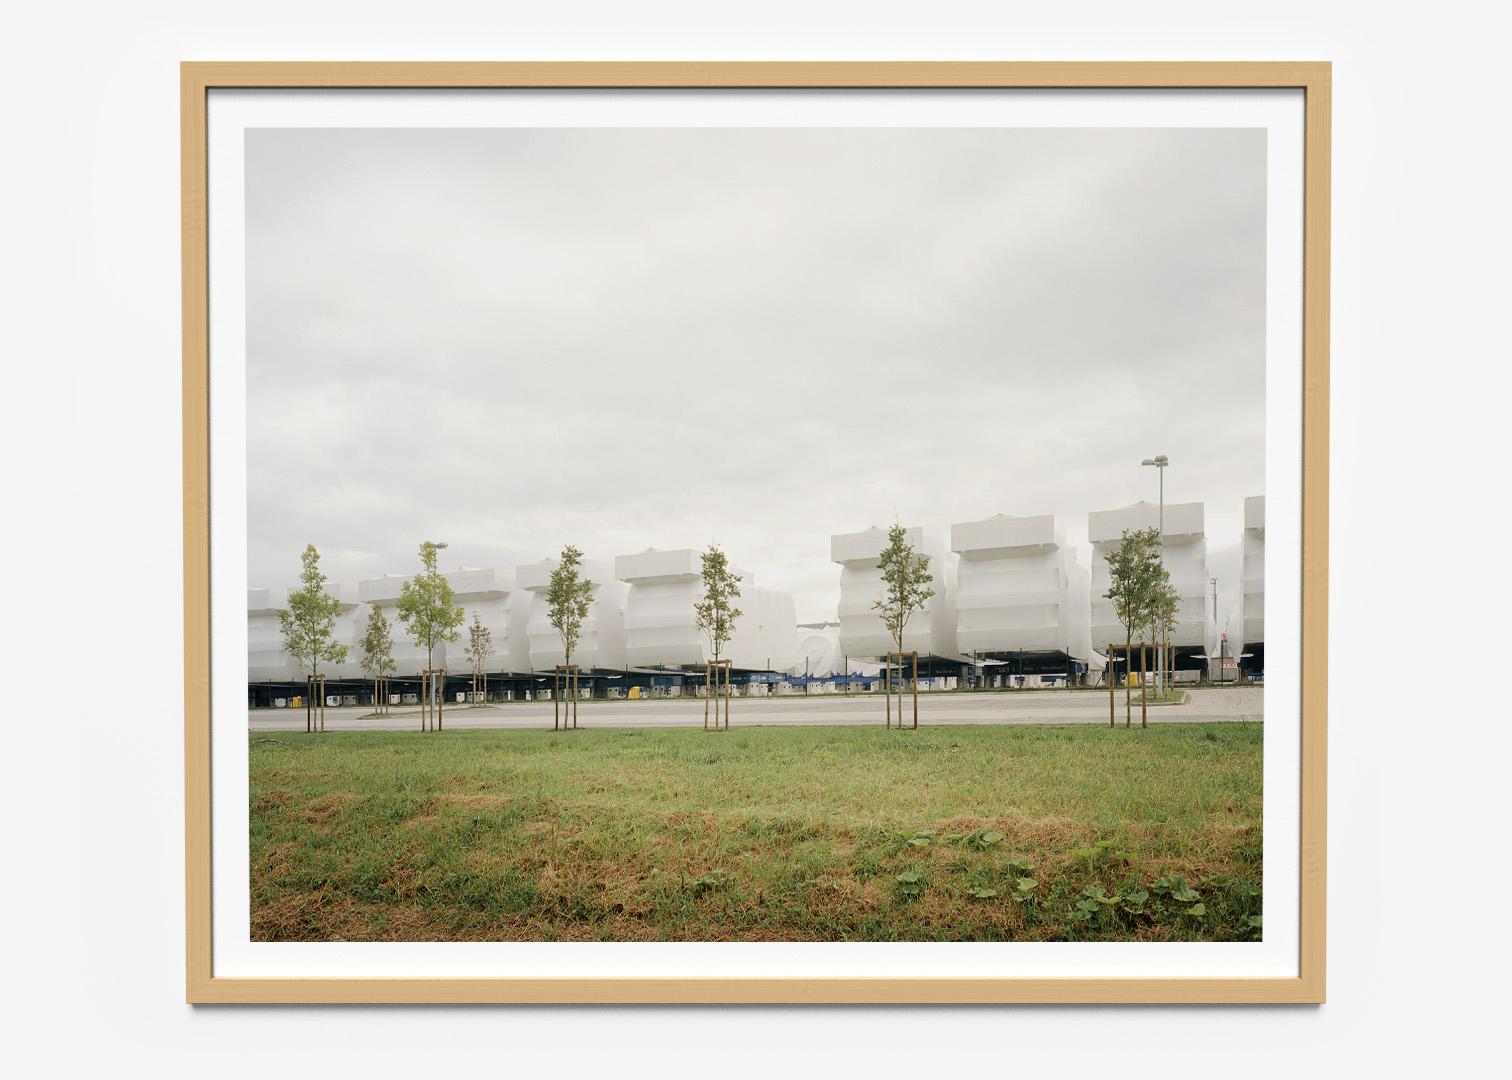 CS_KF_gerahmt _0003_08_Bremerhaven.jpg